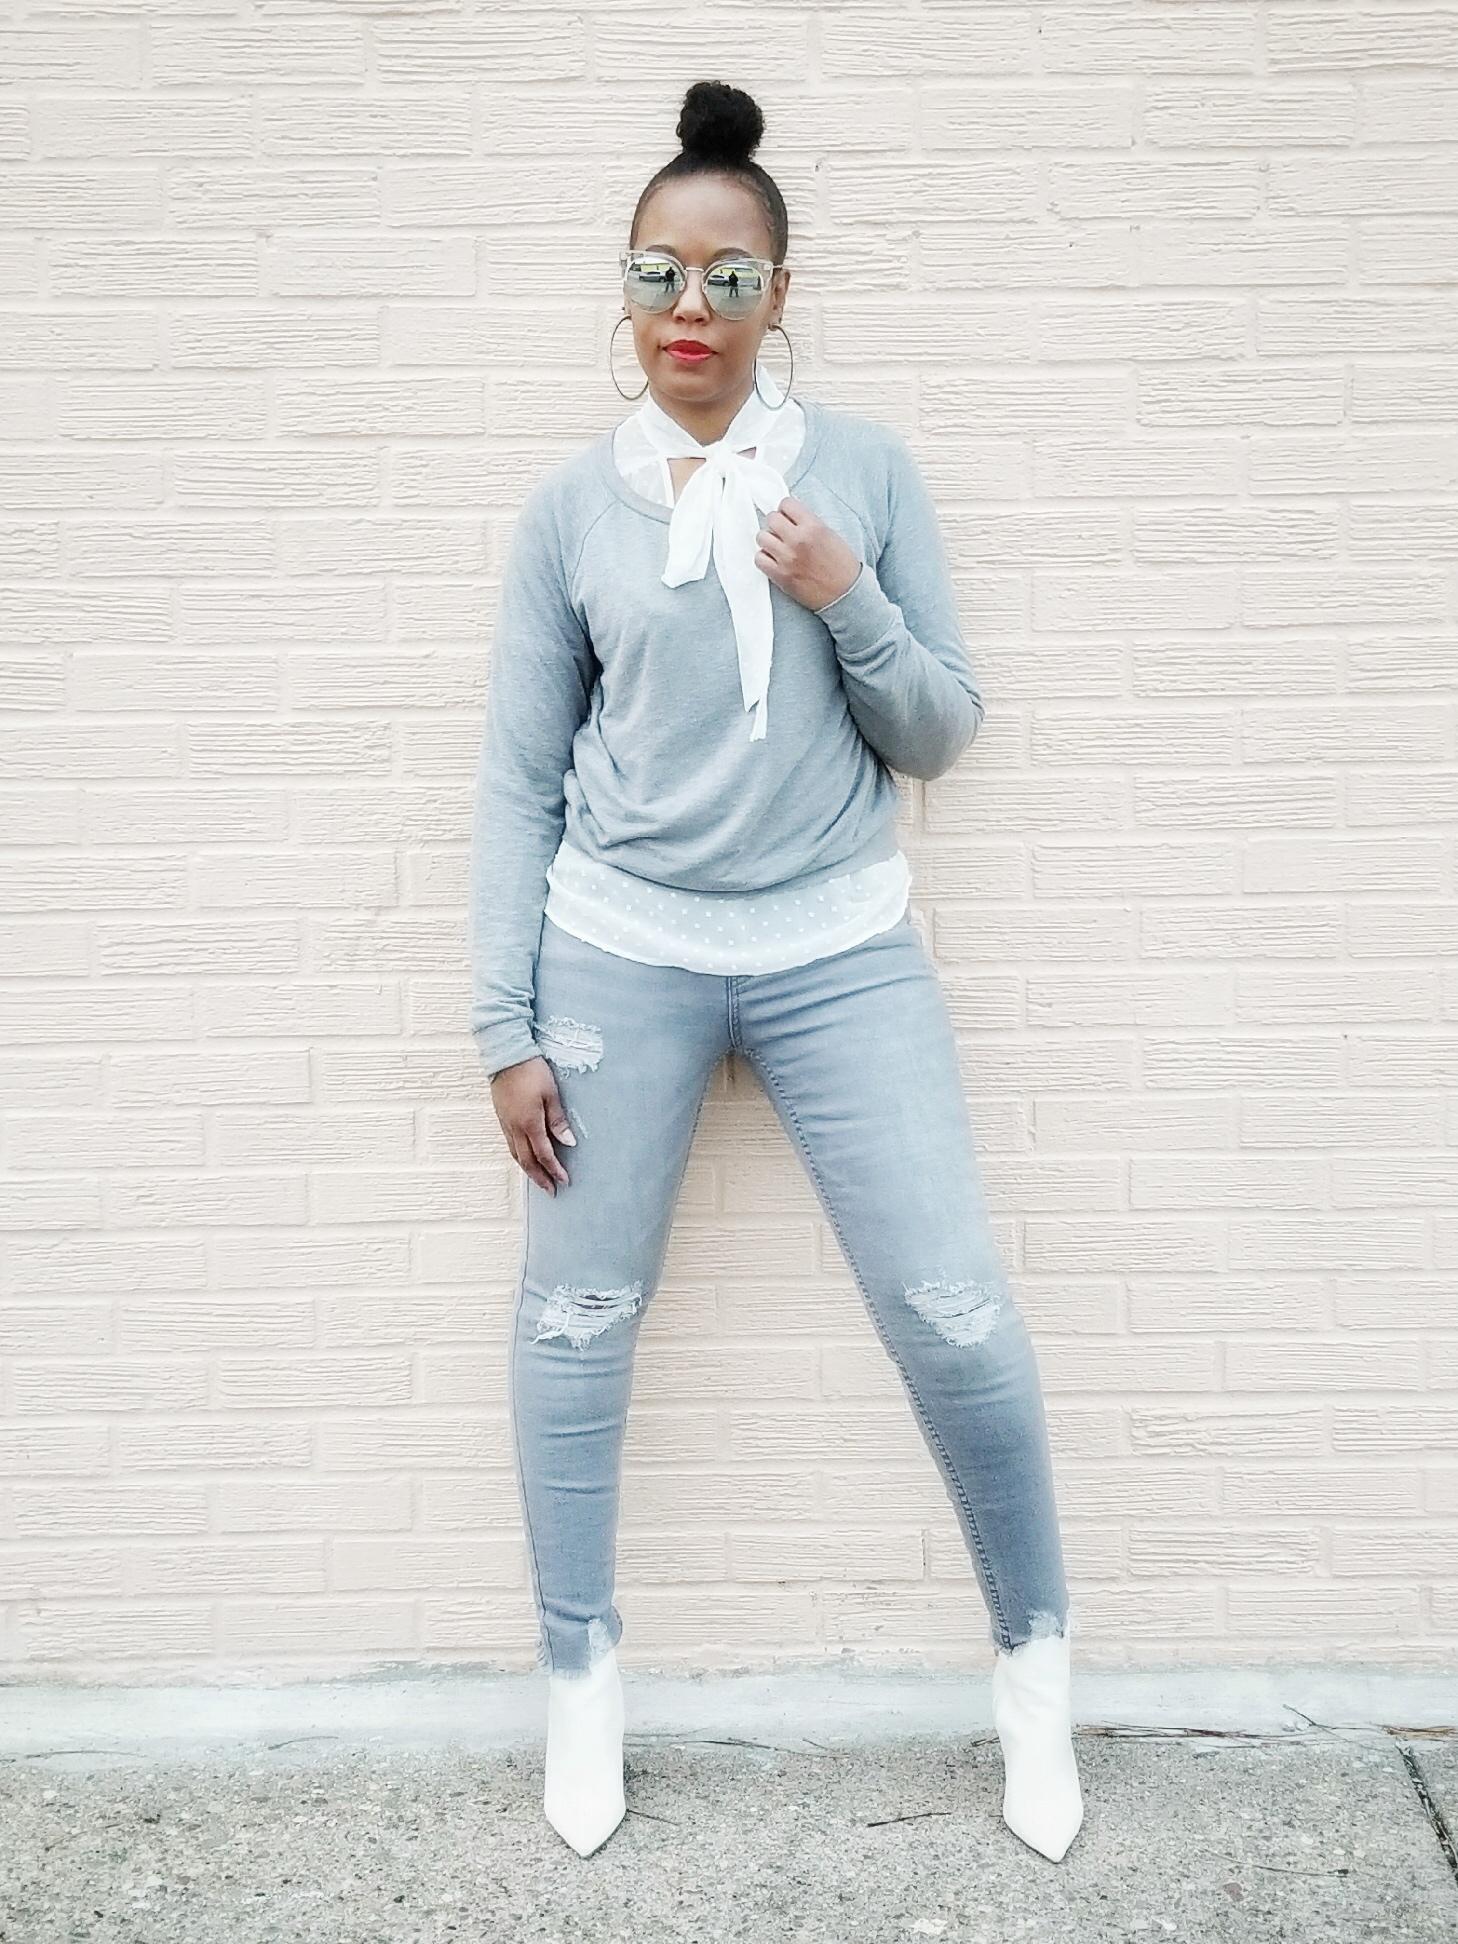 Sweatshirt (Forever21) Alternatives  here  | Top (Primark) | Jeans (Primark) | Booties (Forever21)